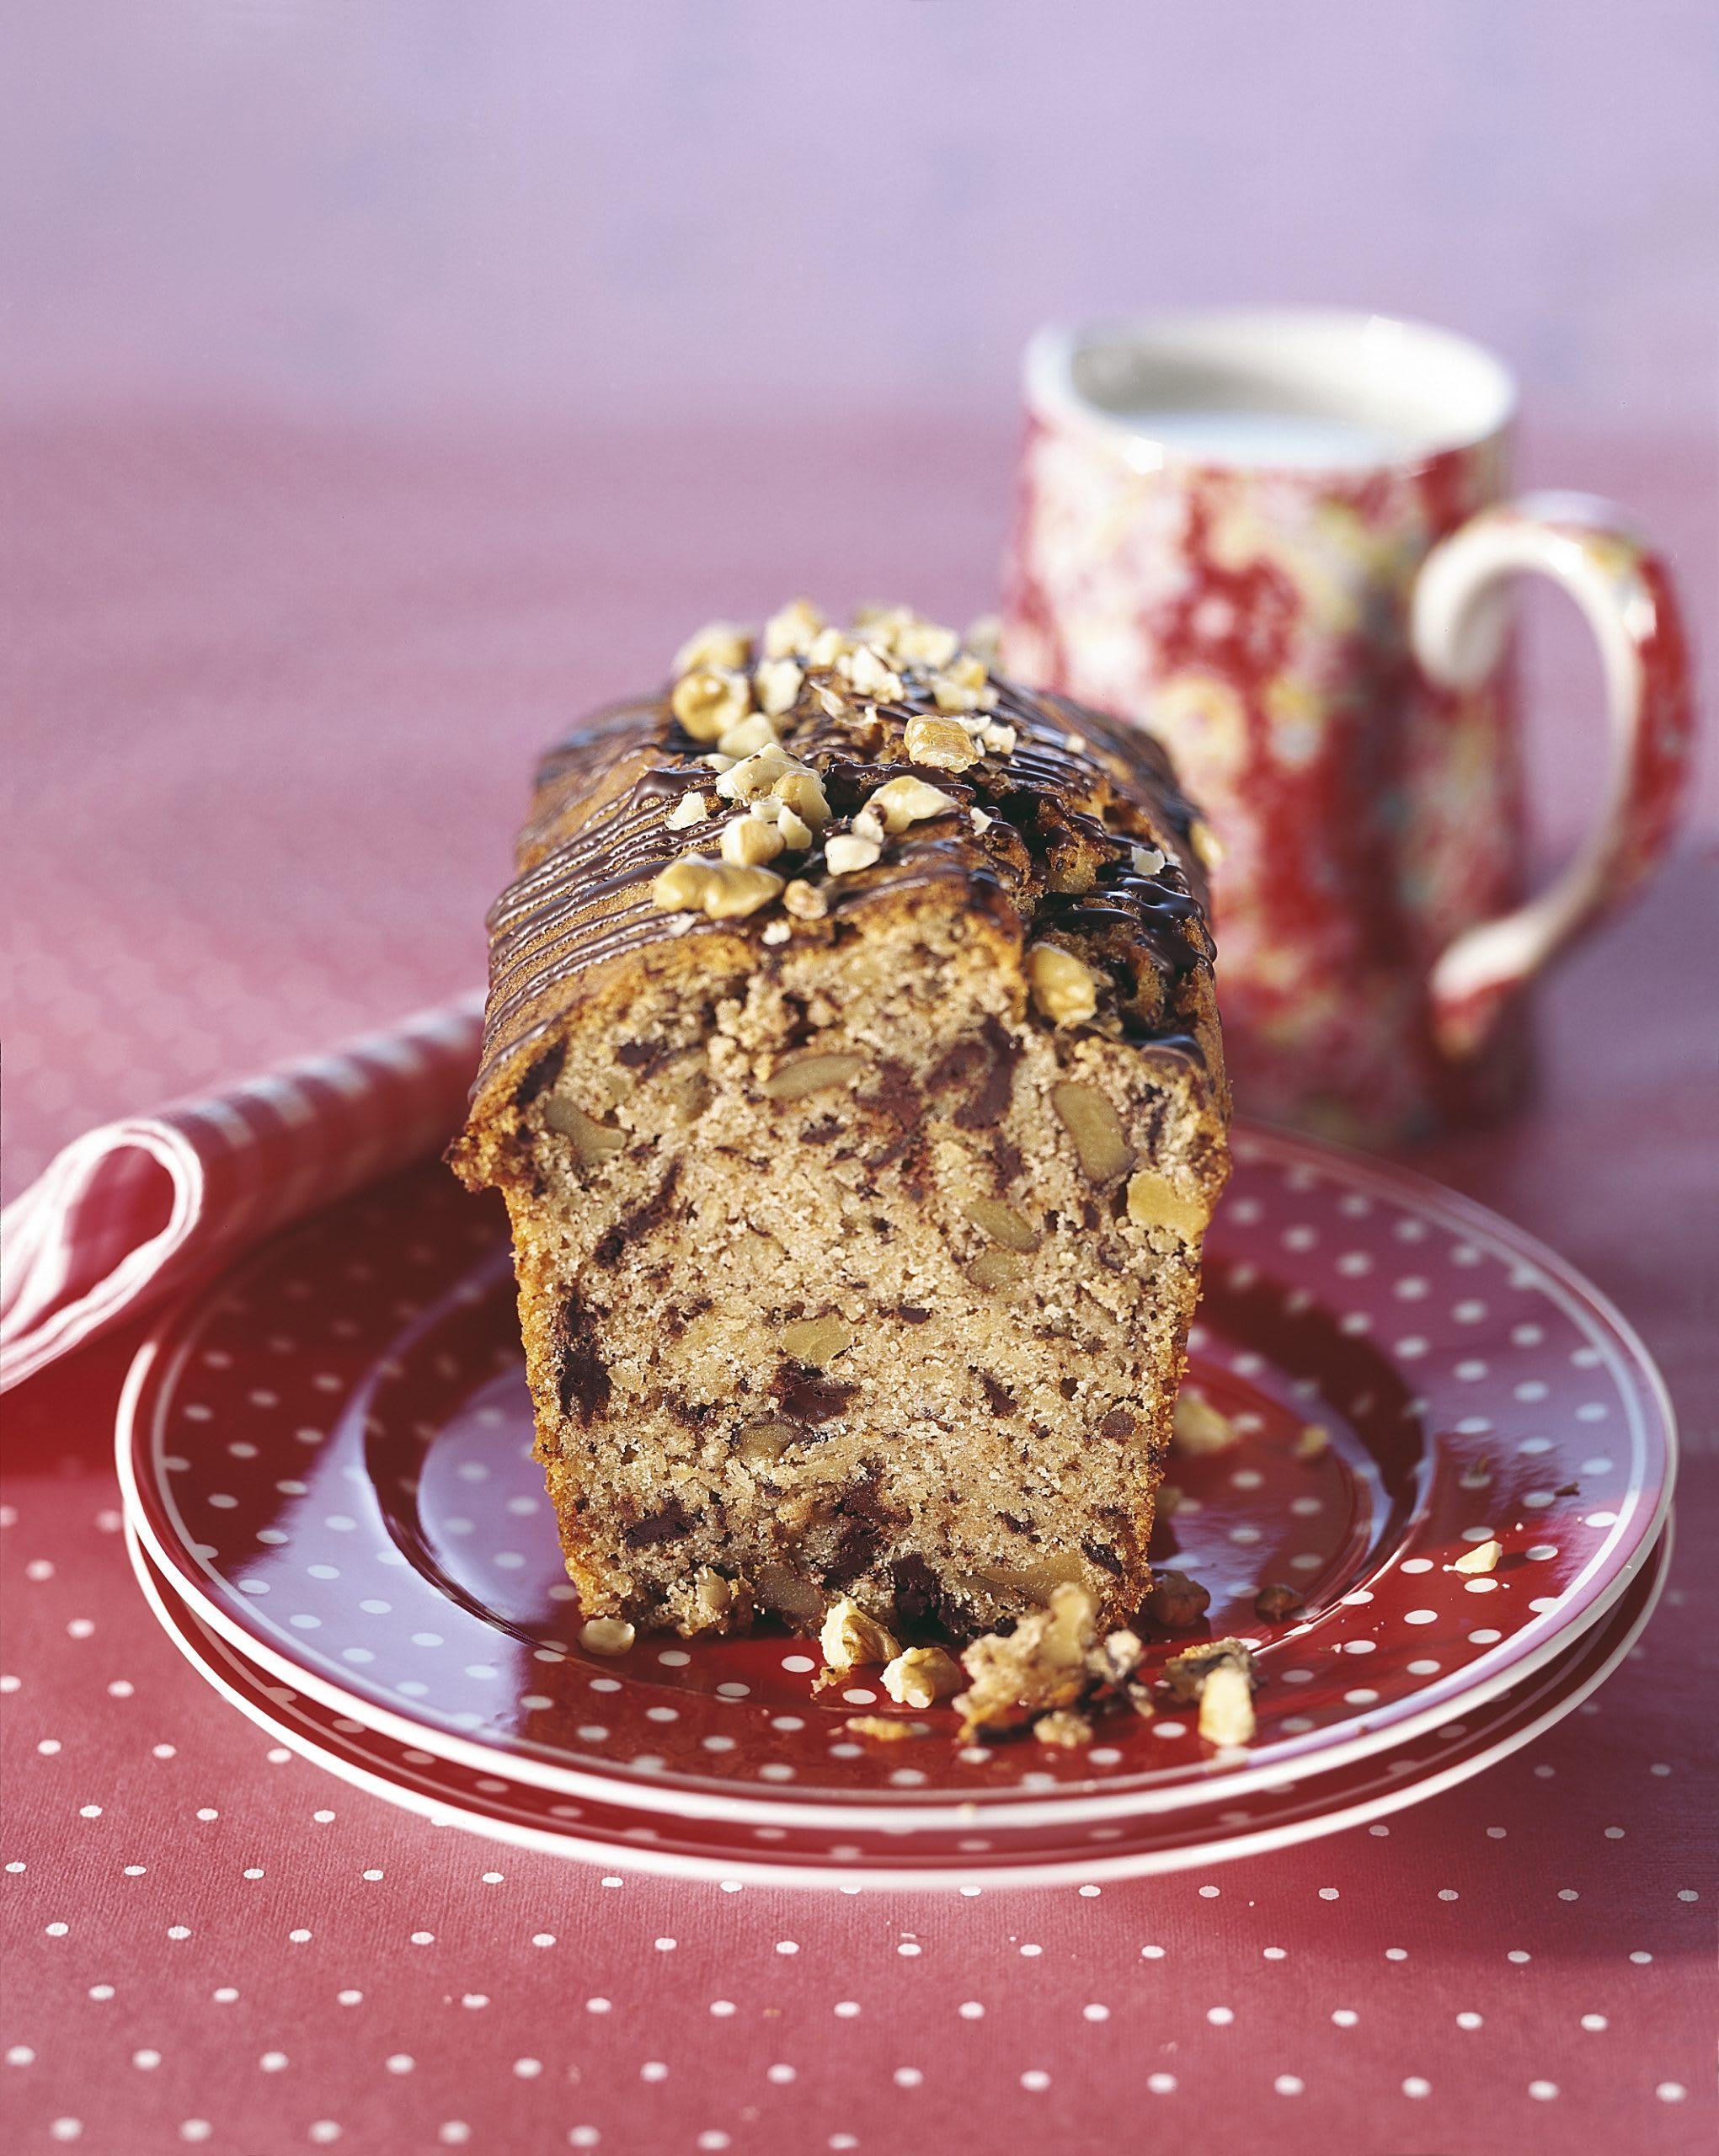 Baumnuss-Schokoladen-Cake